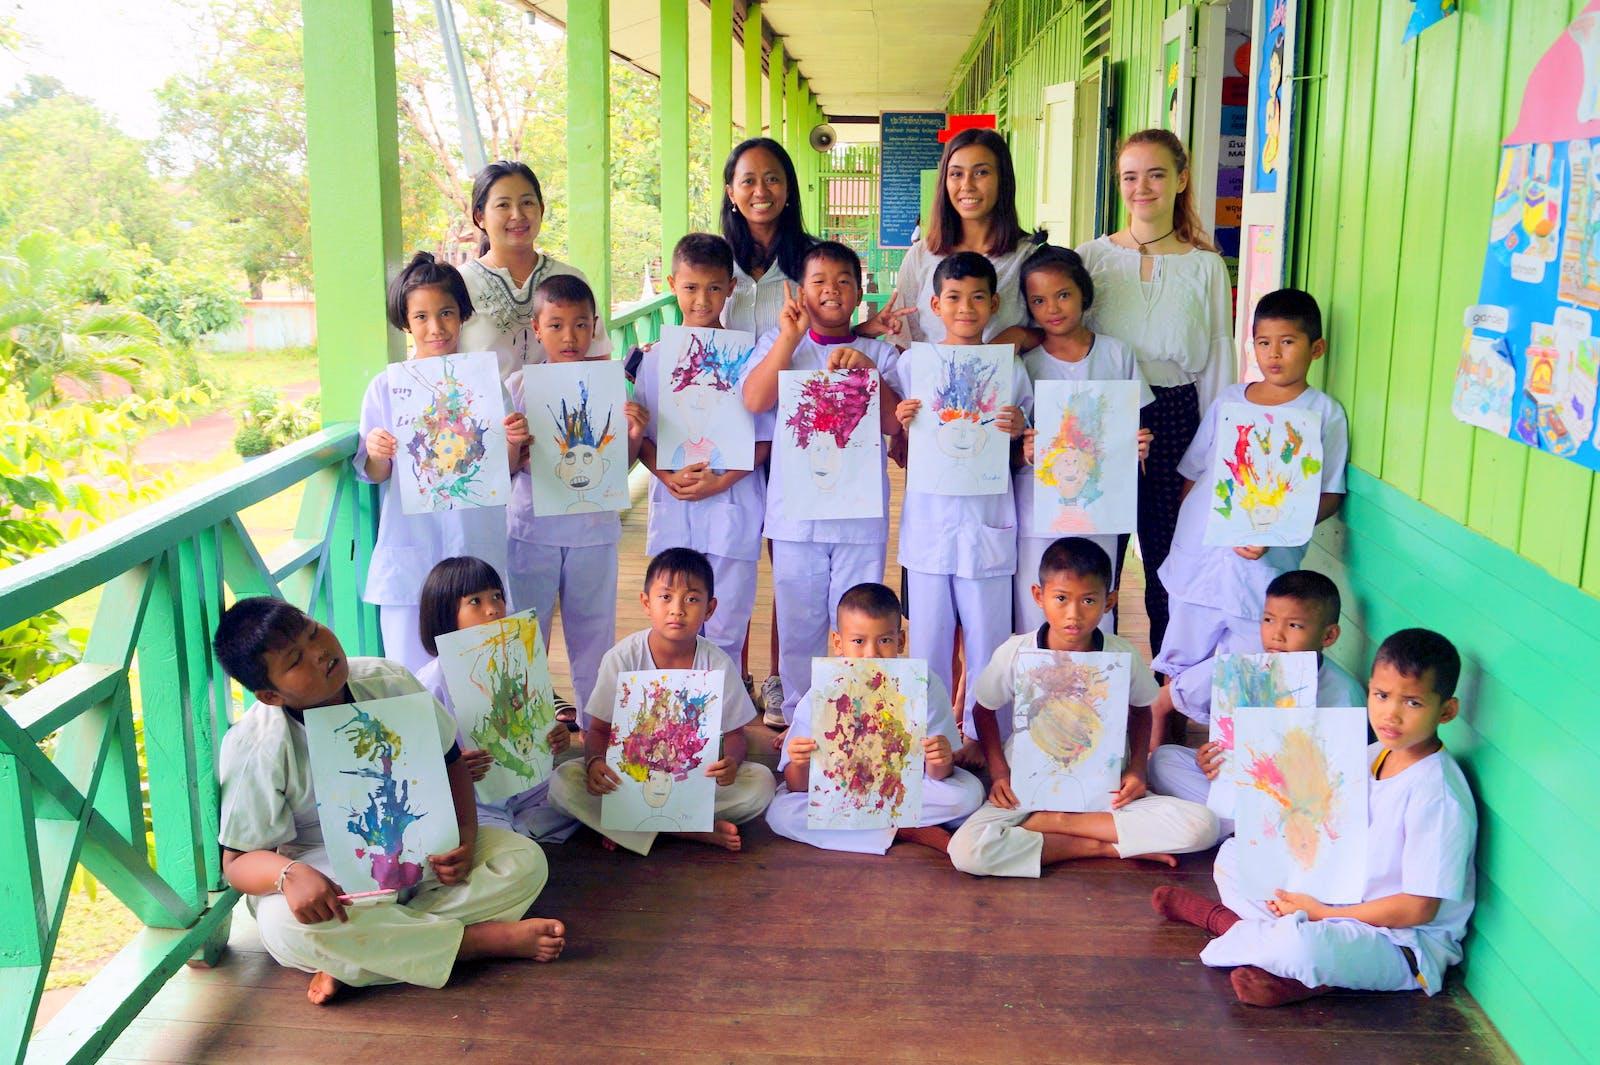 Teaching Art & Craft Classes